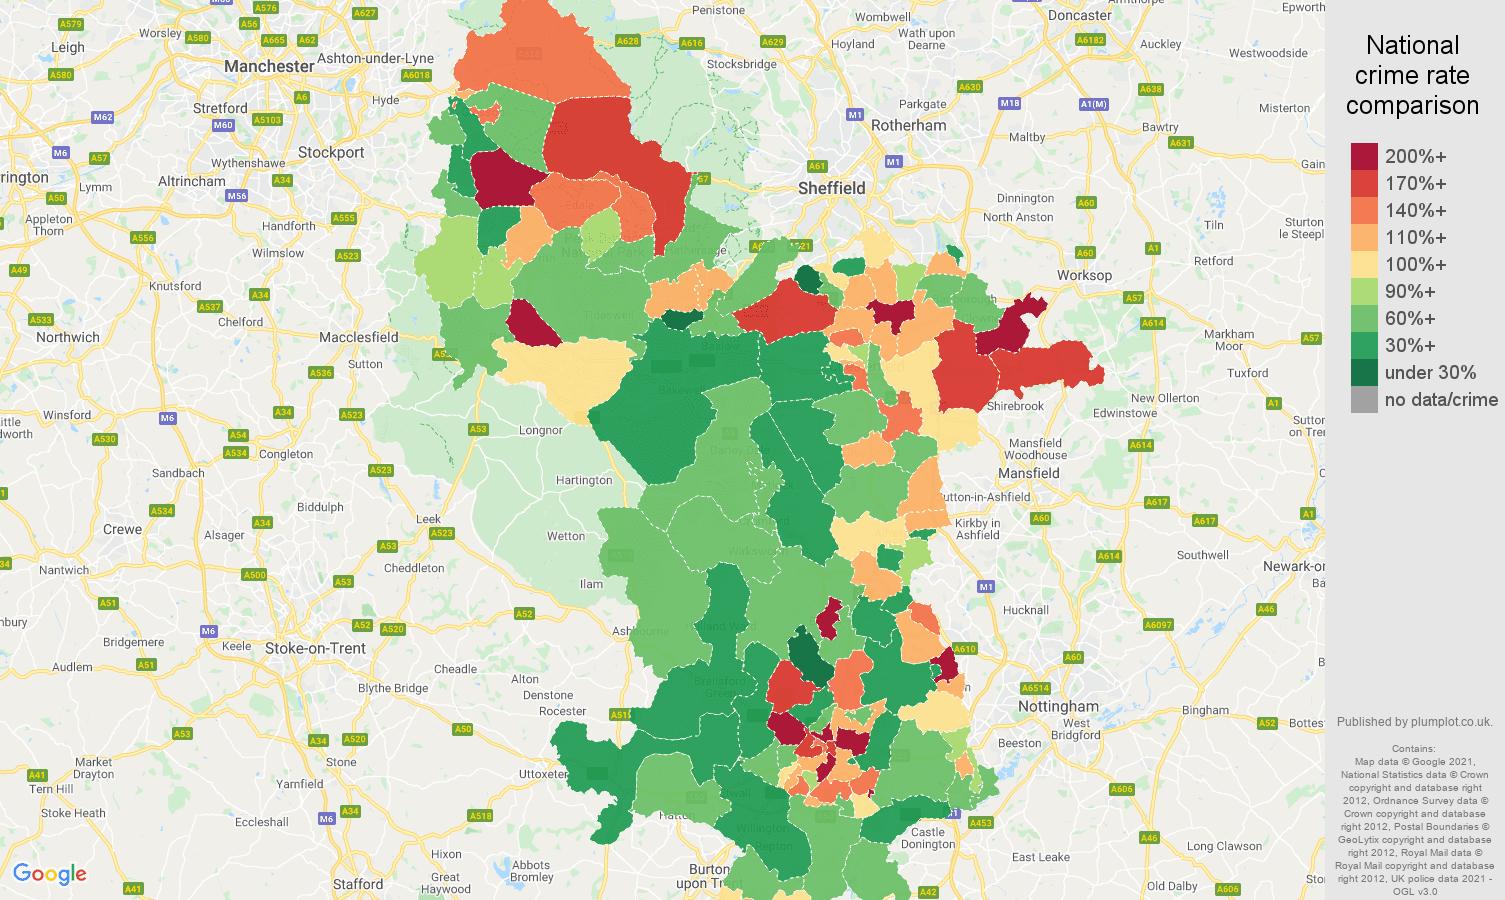 Derbyshire criminal damage and arson crime rate comparison map